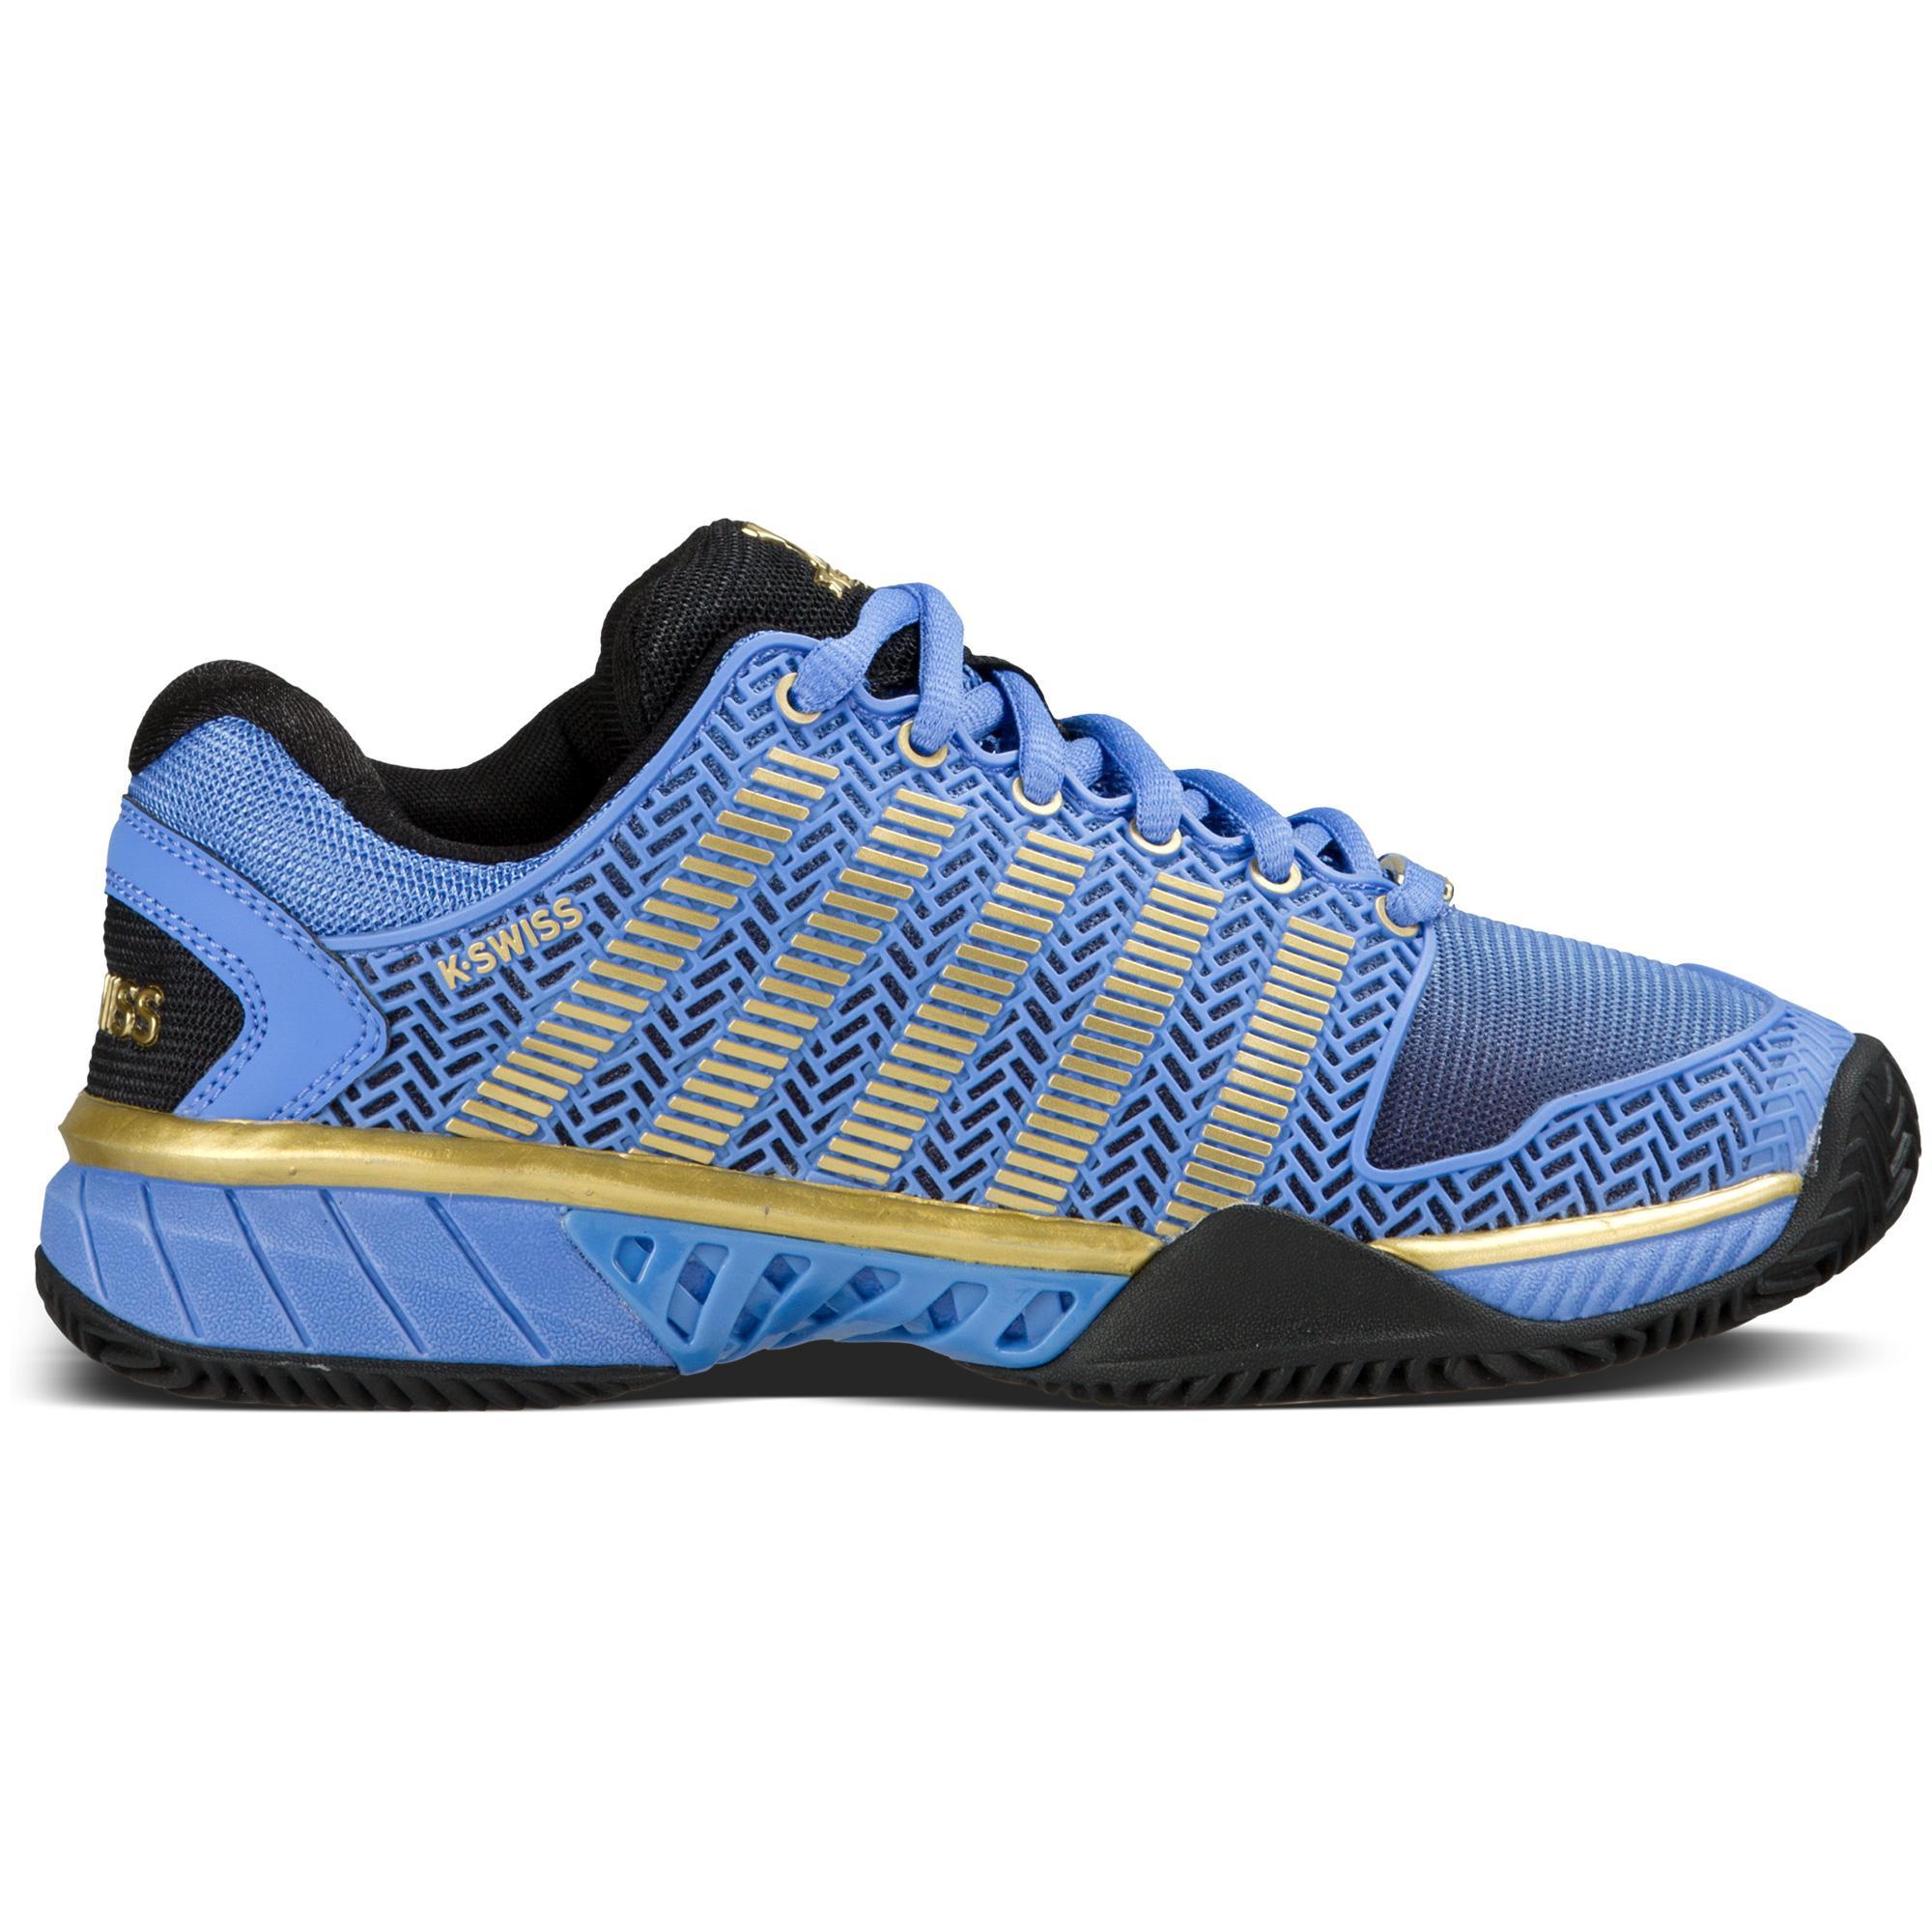 K-Swiss Womens Hypercourt Express Tennis Shoes - 50th Anniversary - Tennisnuts.com